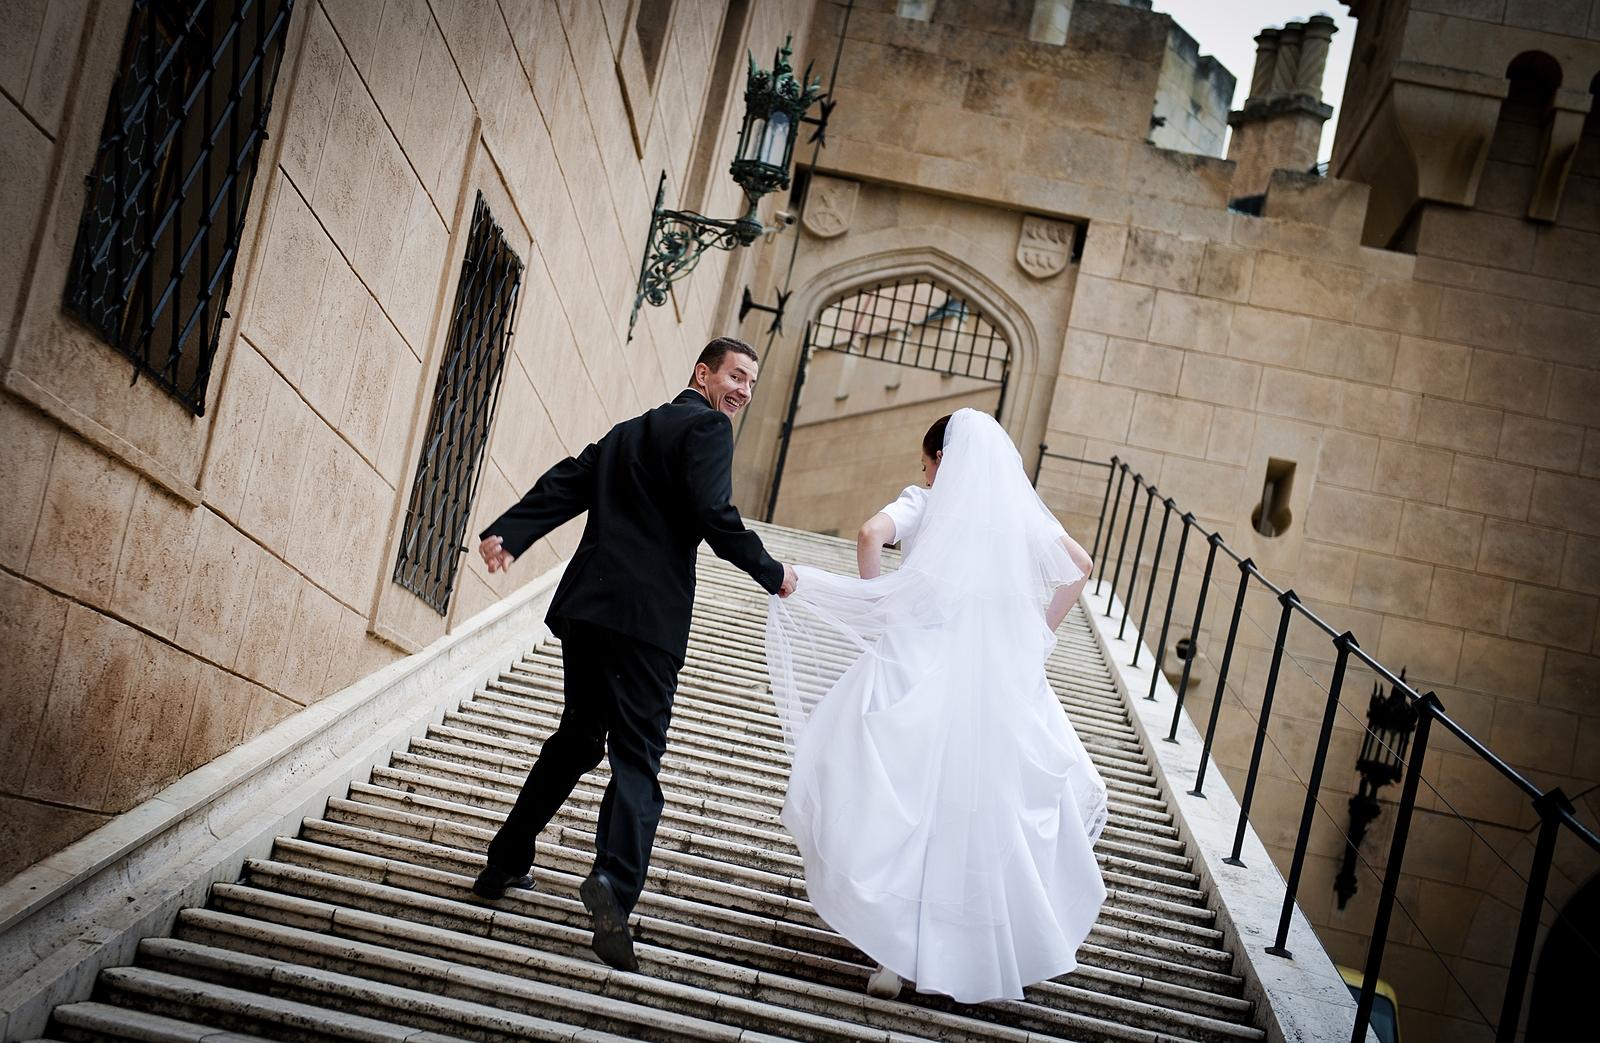 بالصور اجمل صور عرسان , شاهد بالصور اجمل البومات الصور للعرسان 430 13